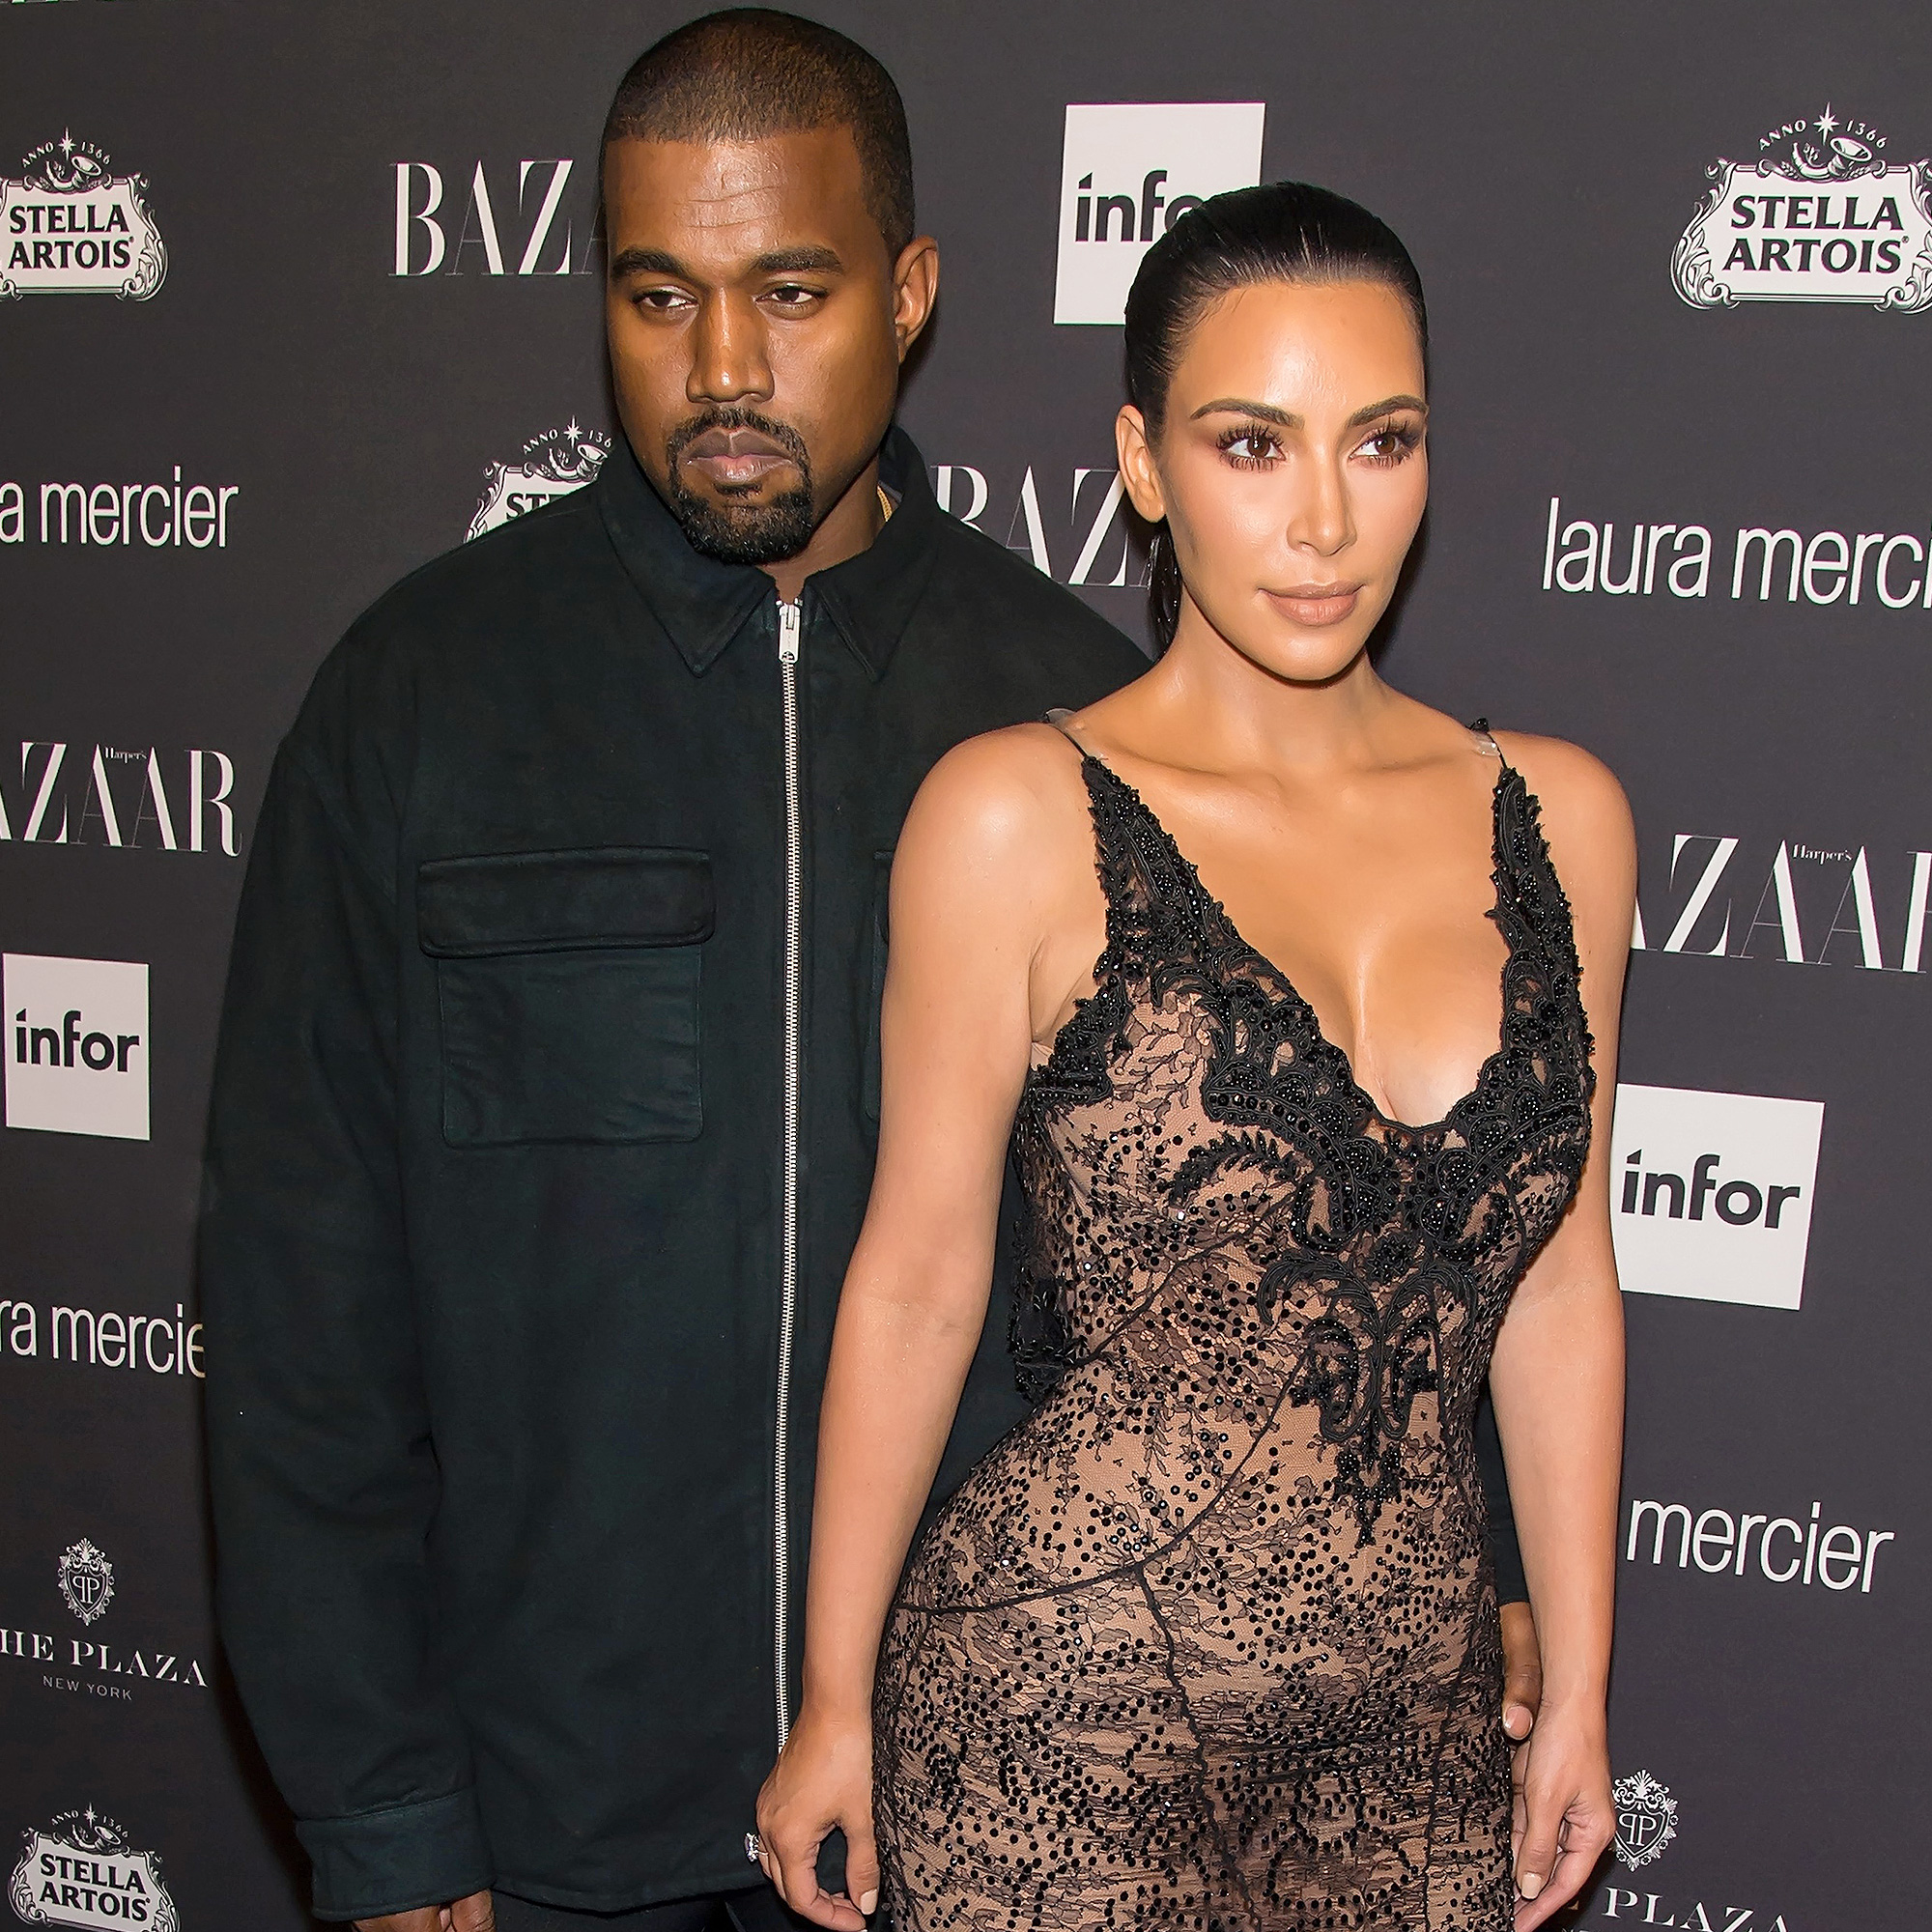 Kim Kardashian, Kanye West, Charlamagne Tha God - Kanye West and Kim Kardashian West attend Harper's BAZAAR Celebrates 'ICONS By Carine Roitfeld' at The Plaza Hotel on September 9, 2016 in New York City.